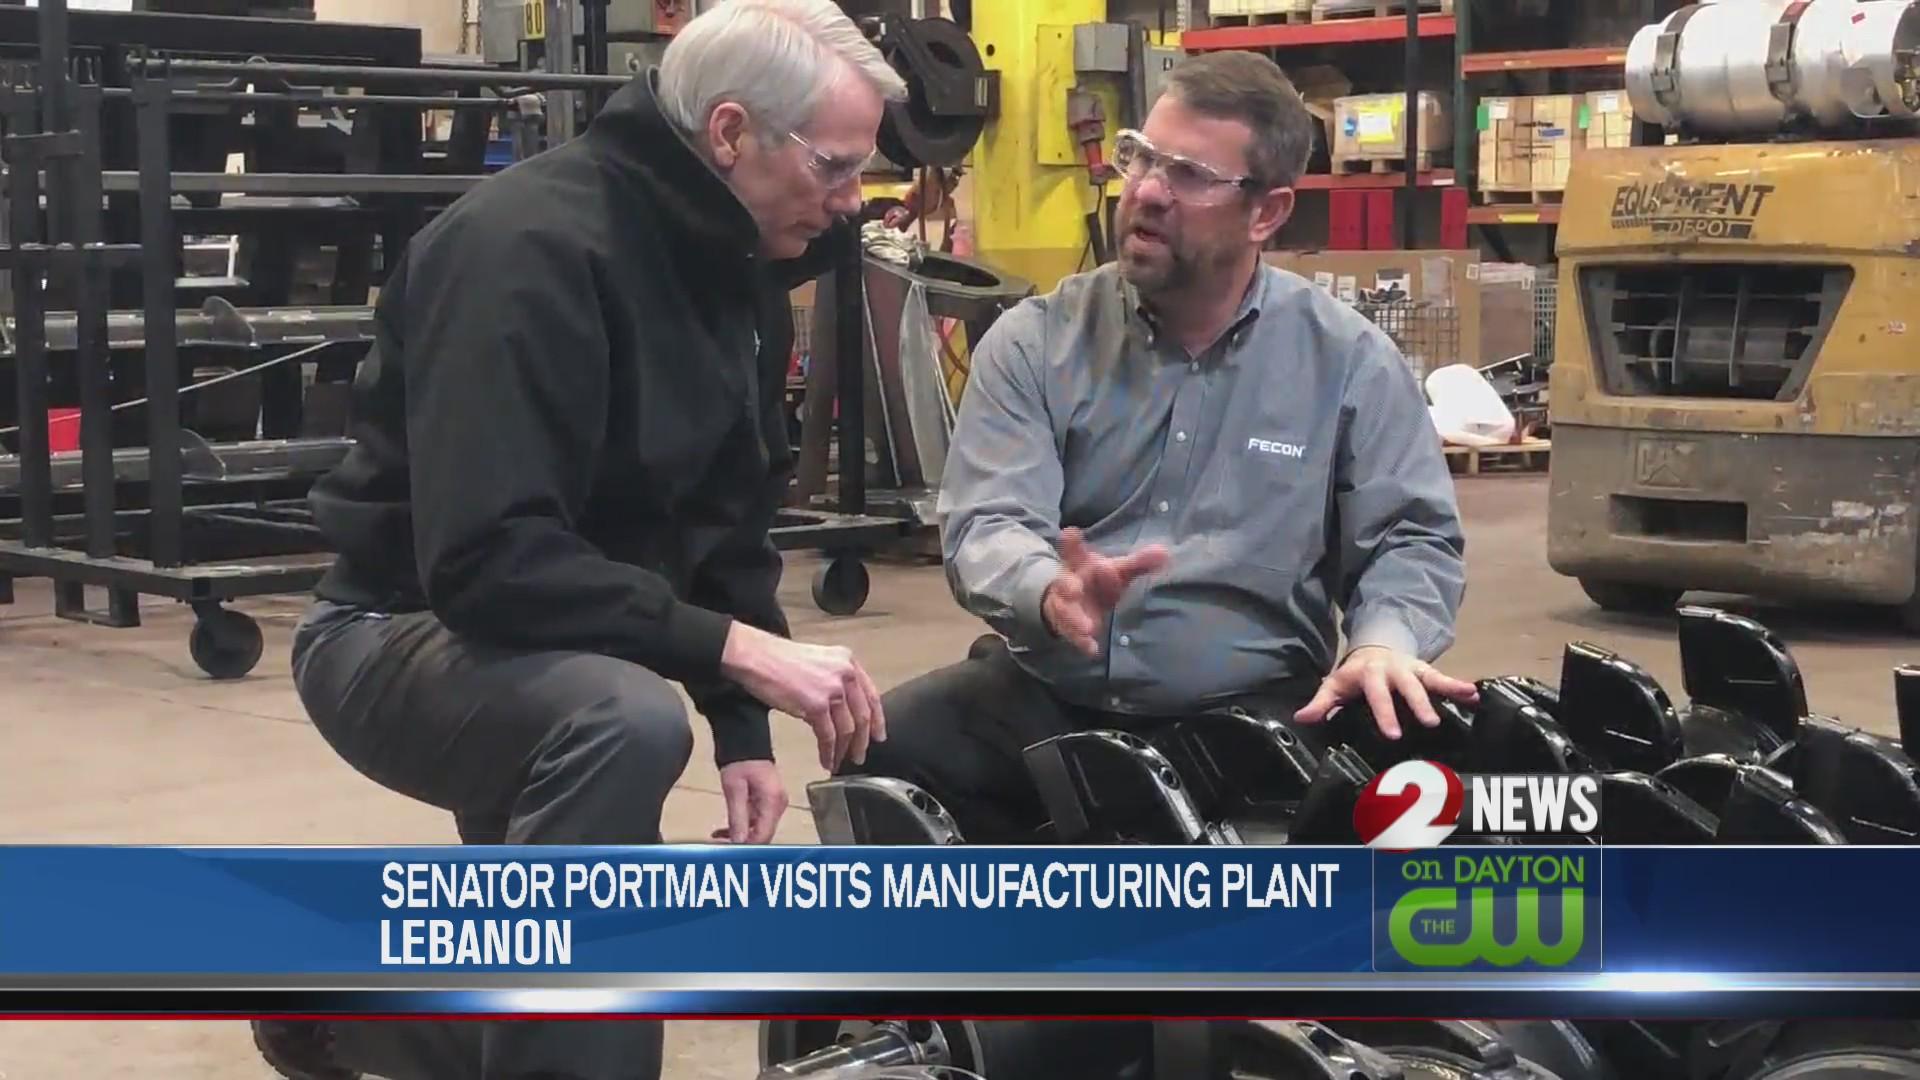 Sen. Portman visits manufacturing plant in Lebanon